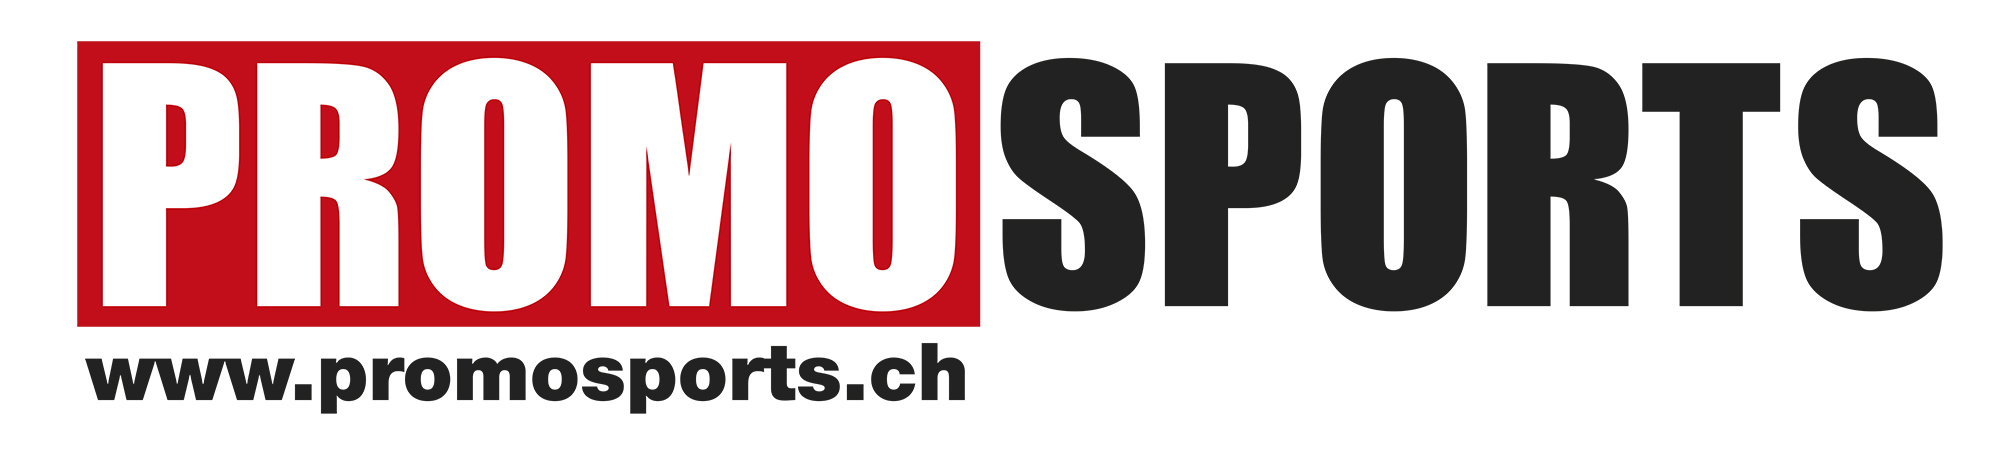 Calendrier Promosport 2021 Ski alpinisme: l'ISMF communiquera le calendrier 2020/2021 en juin